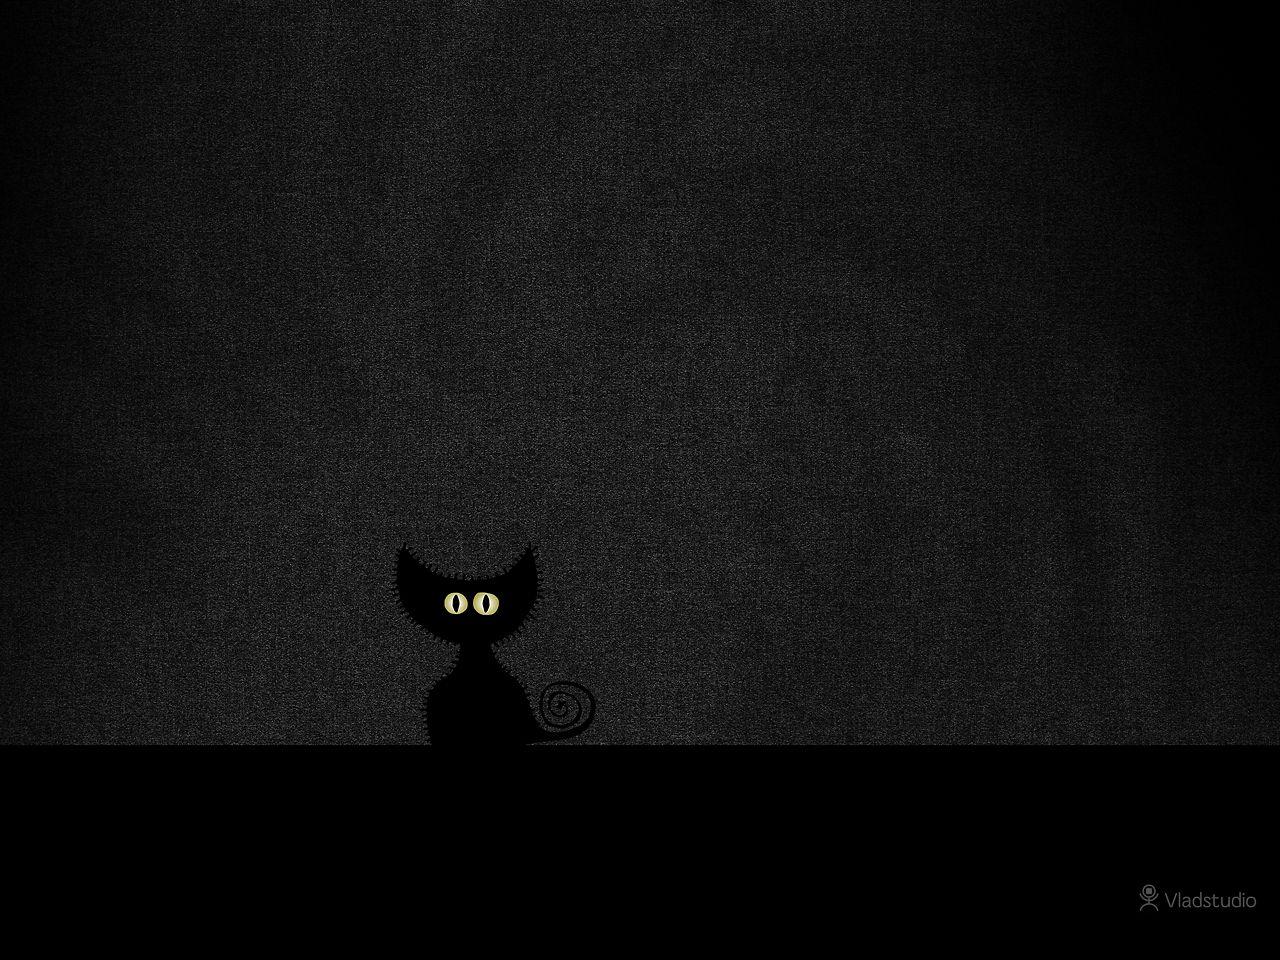 Black Cat In Dark Room Vladstudio Free Desktop Wallpapers 3 My Favorite Black Cat Illustration Cat Illustration Cat Wallpaper